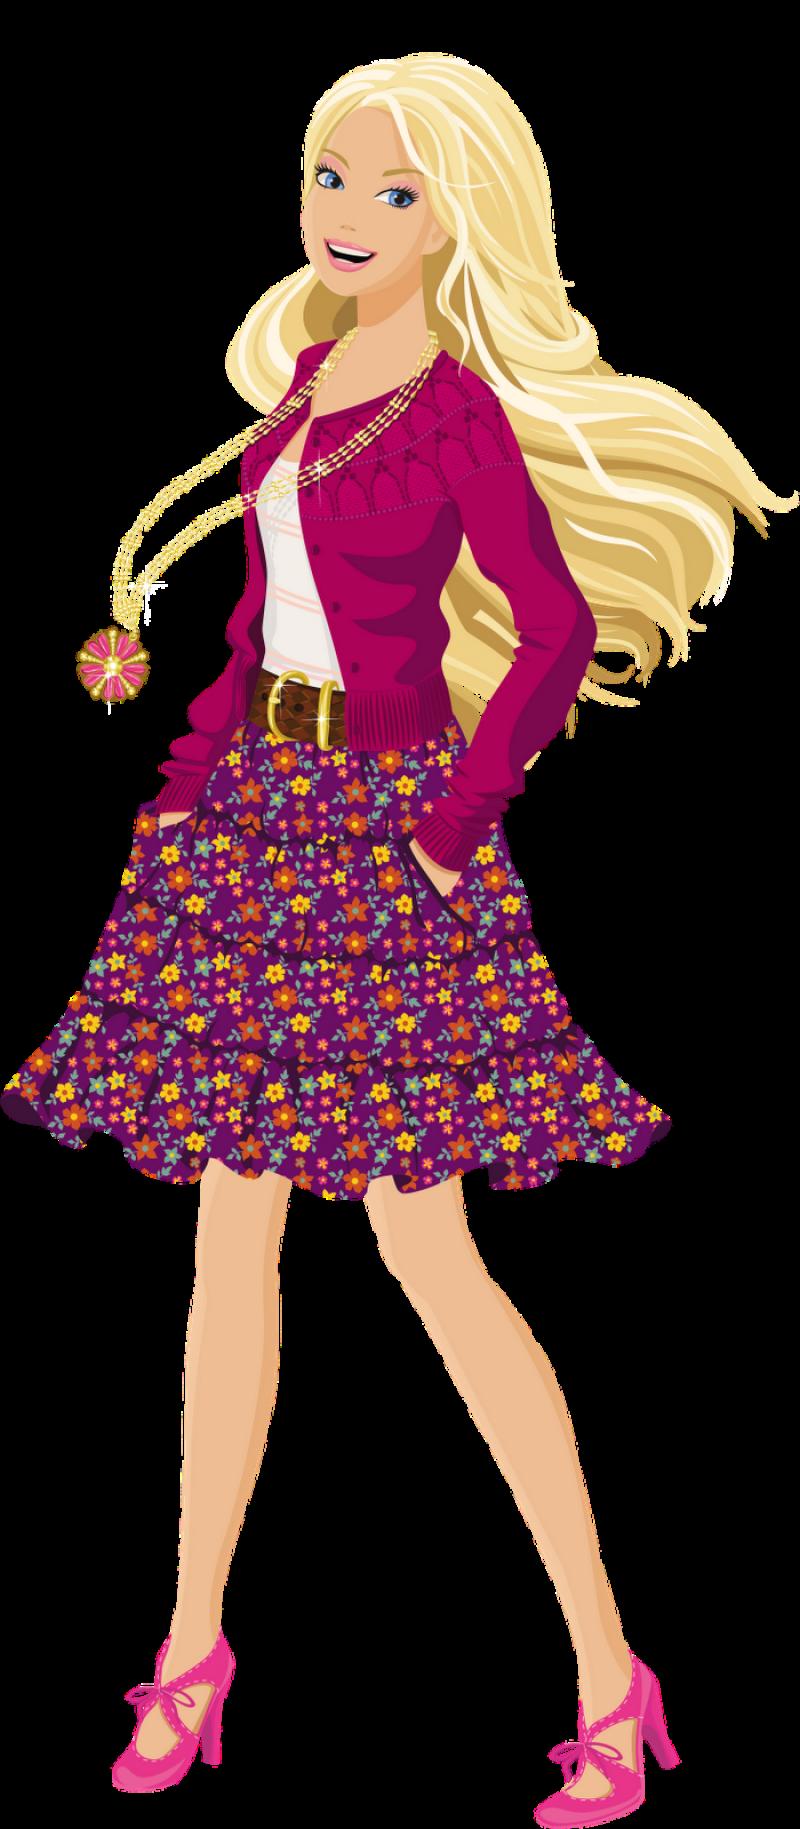 Barbie PNG Image